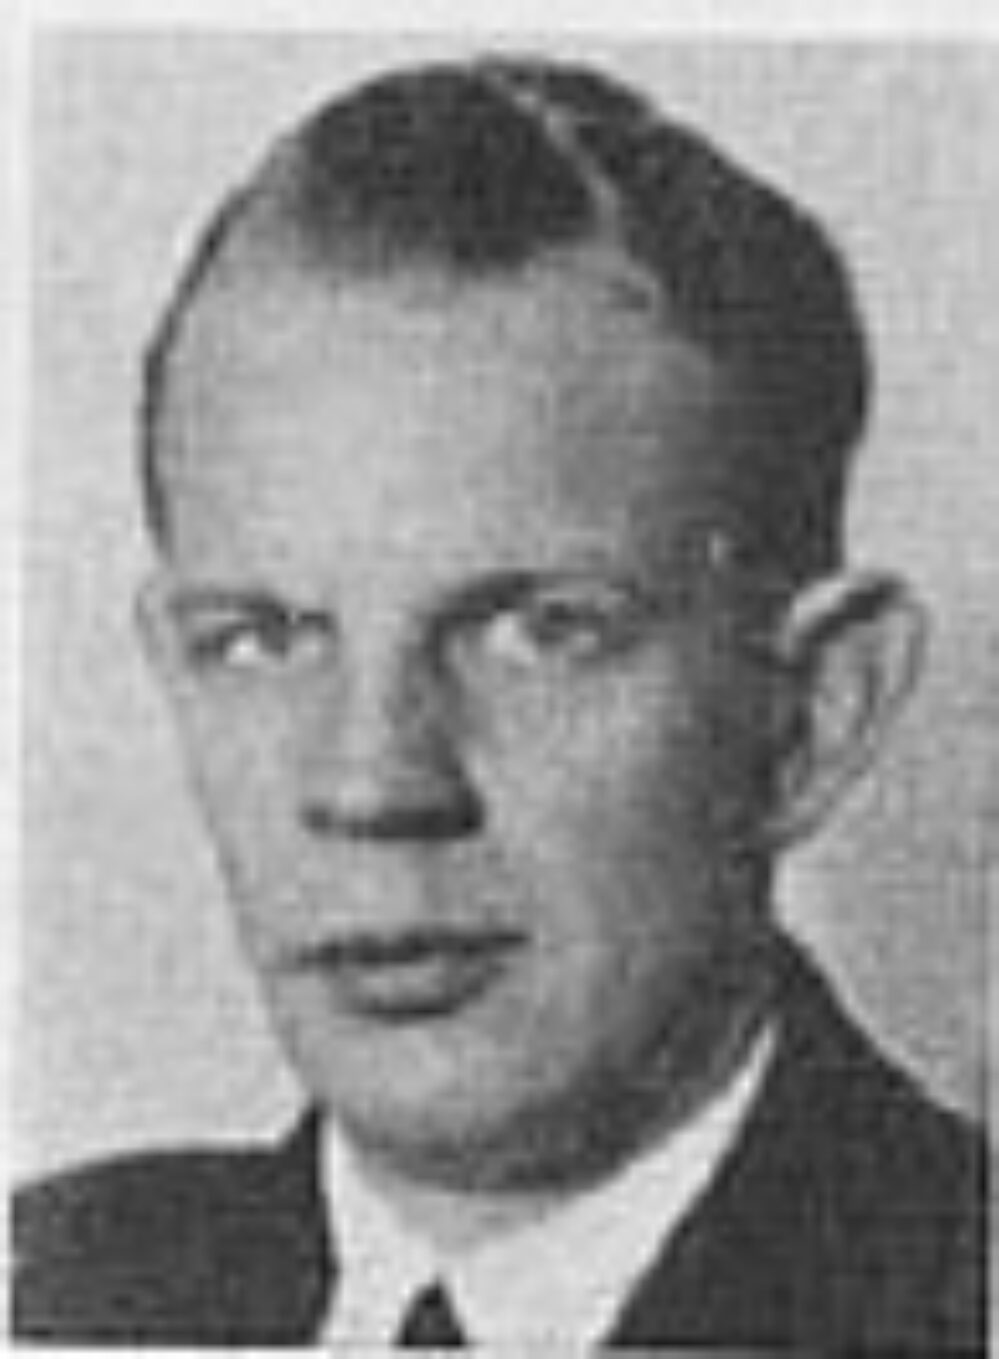 Olav Sundby